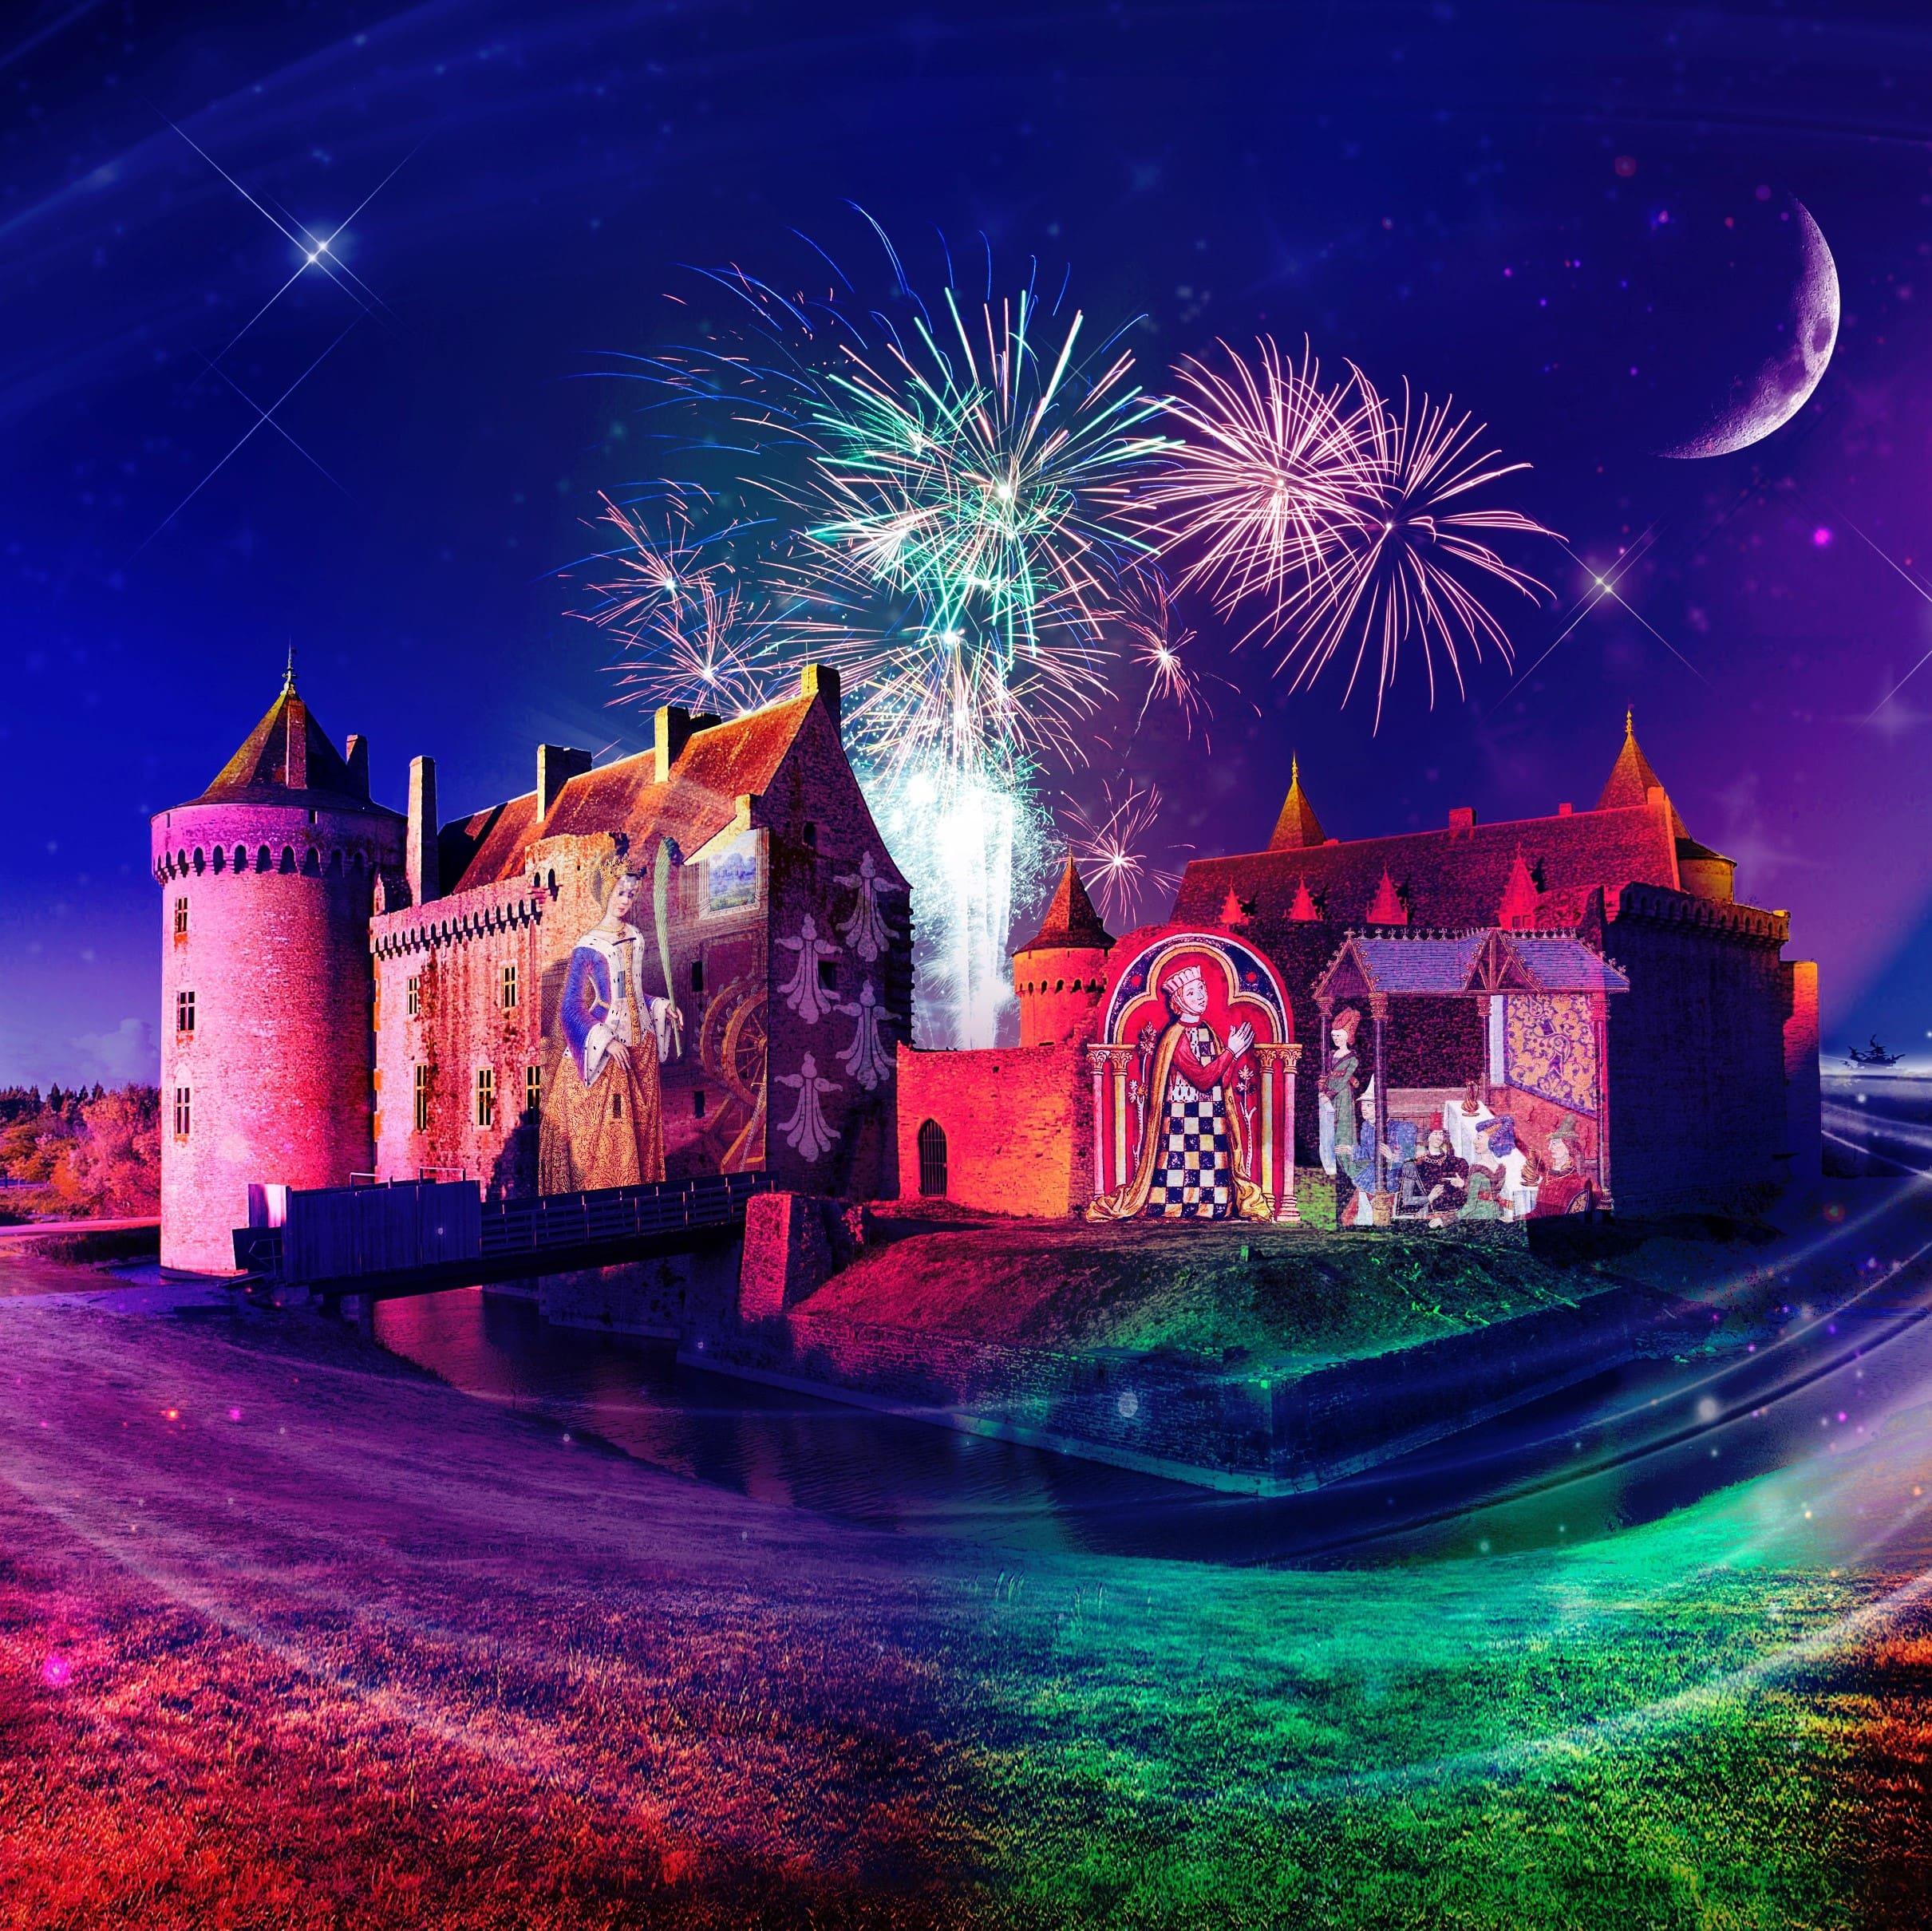 Spectacle nocturne au château de Suscinio